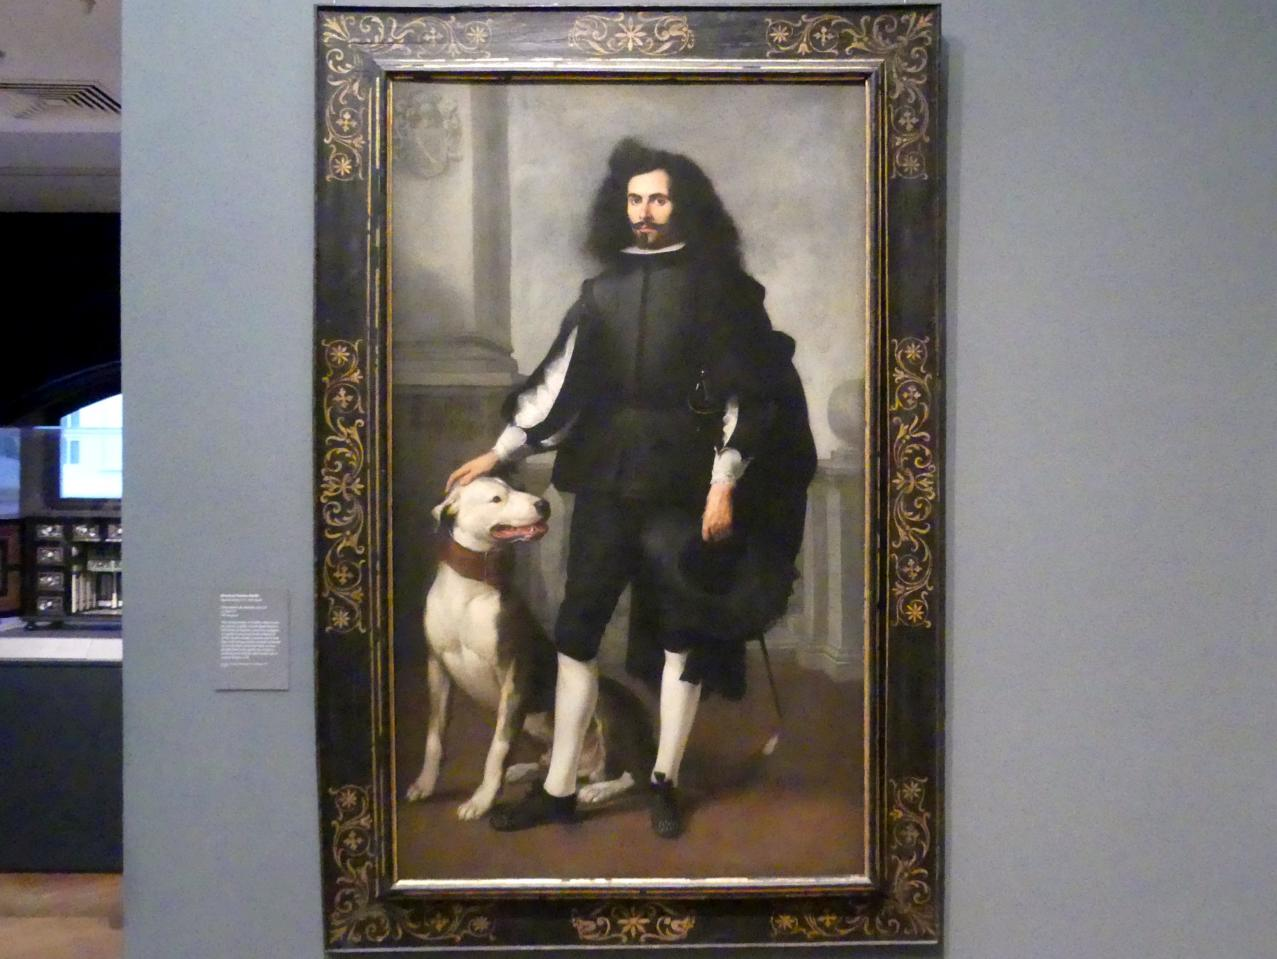 Bartolomé Esteban Murillo: Don Andrés de Andrade y la Cal, um 1665 - 1672